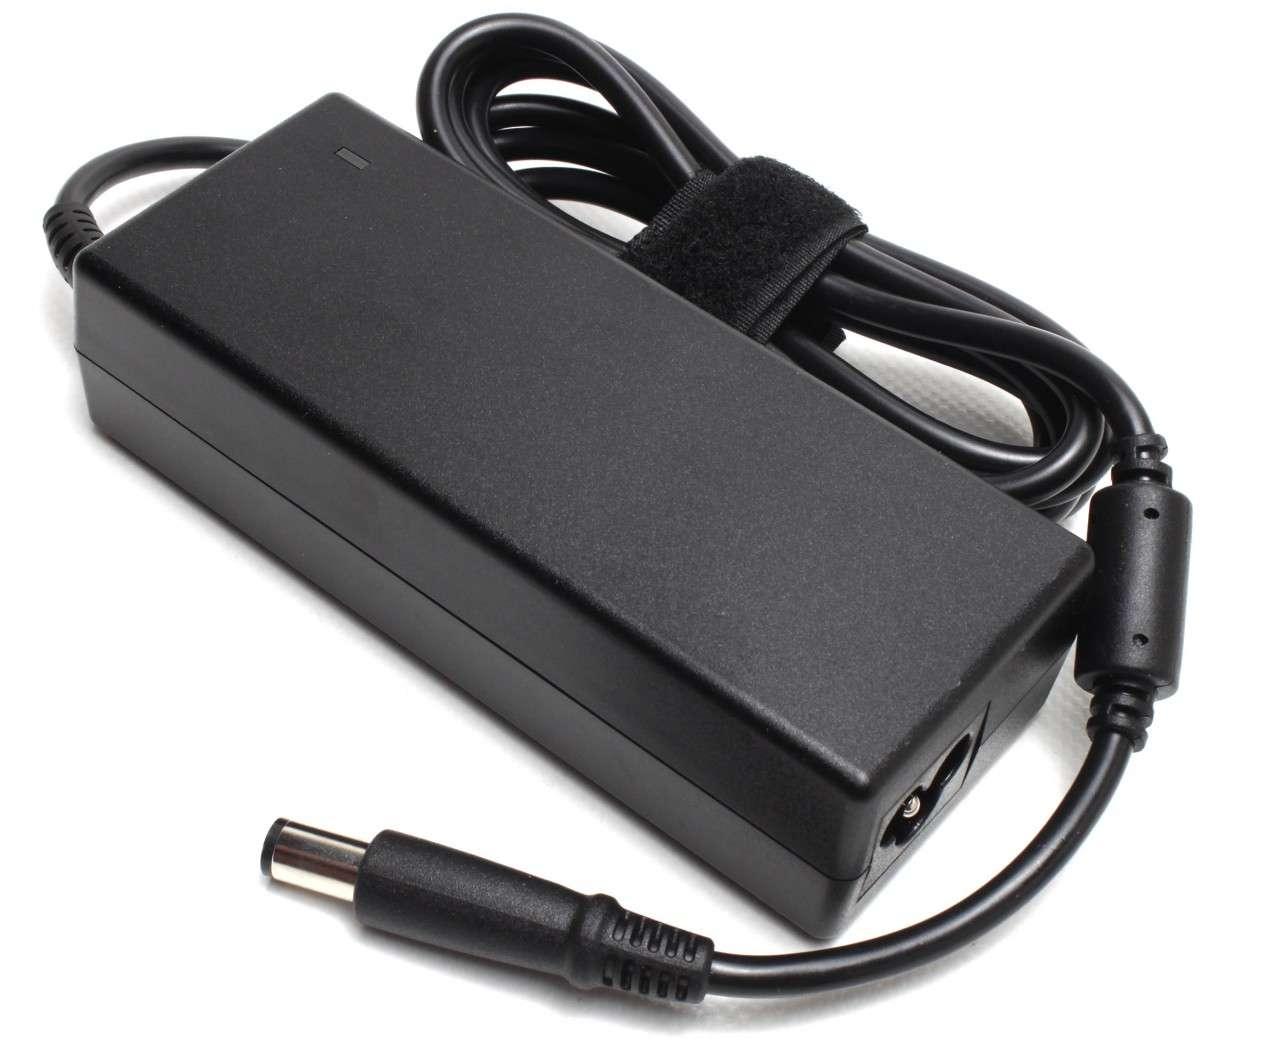 Incarcator Dell Inspiron 7537 VARIANTA 3 imagine powerlaptop.ro 2021